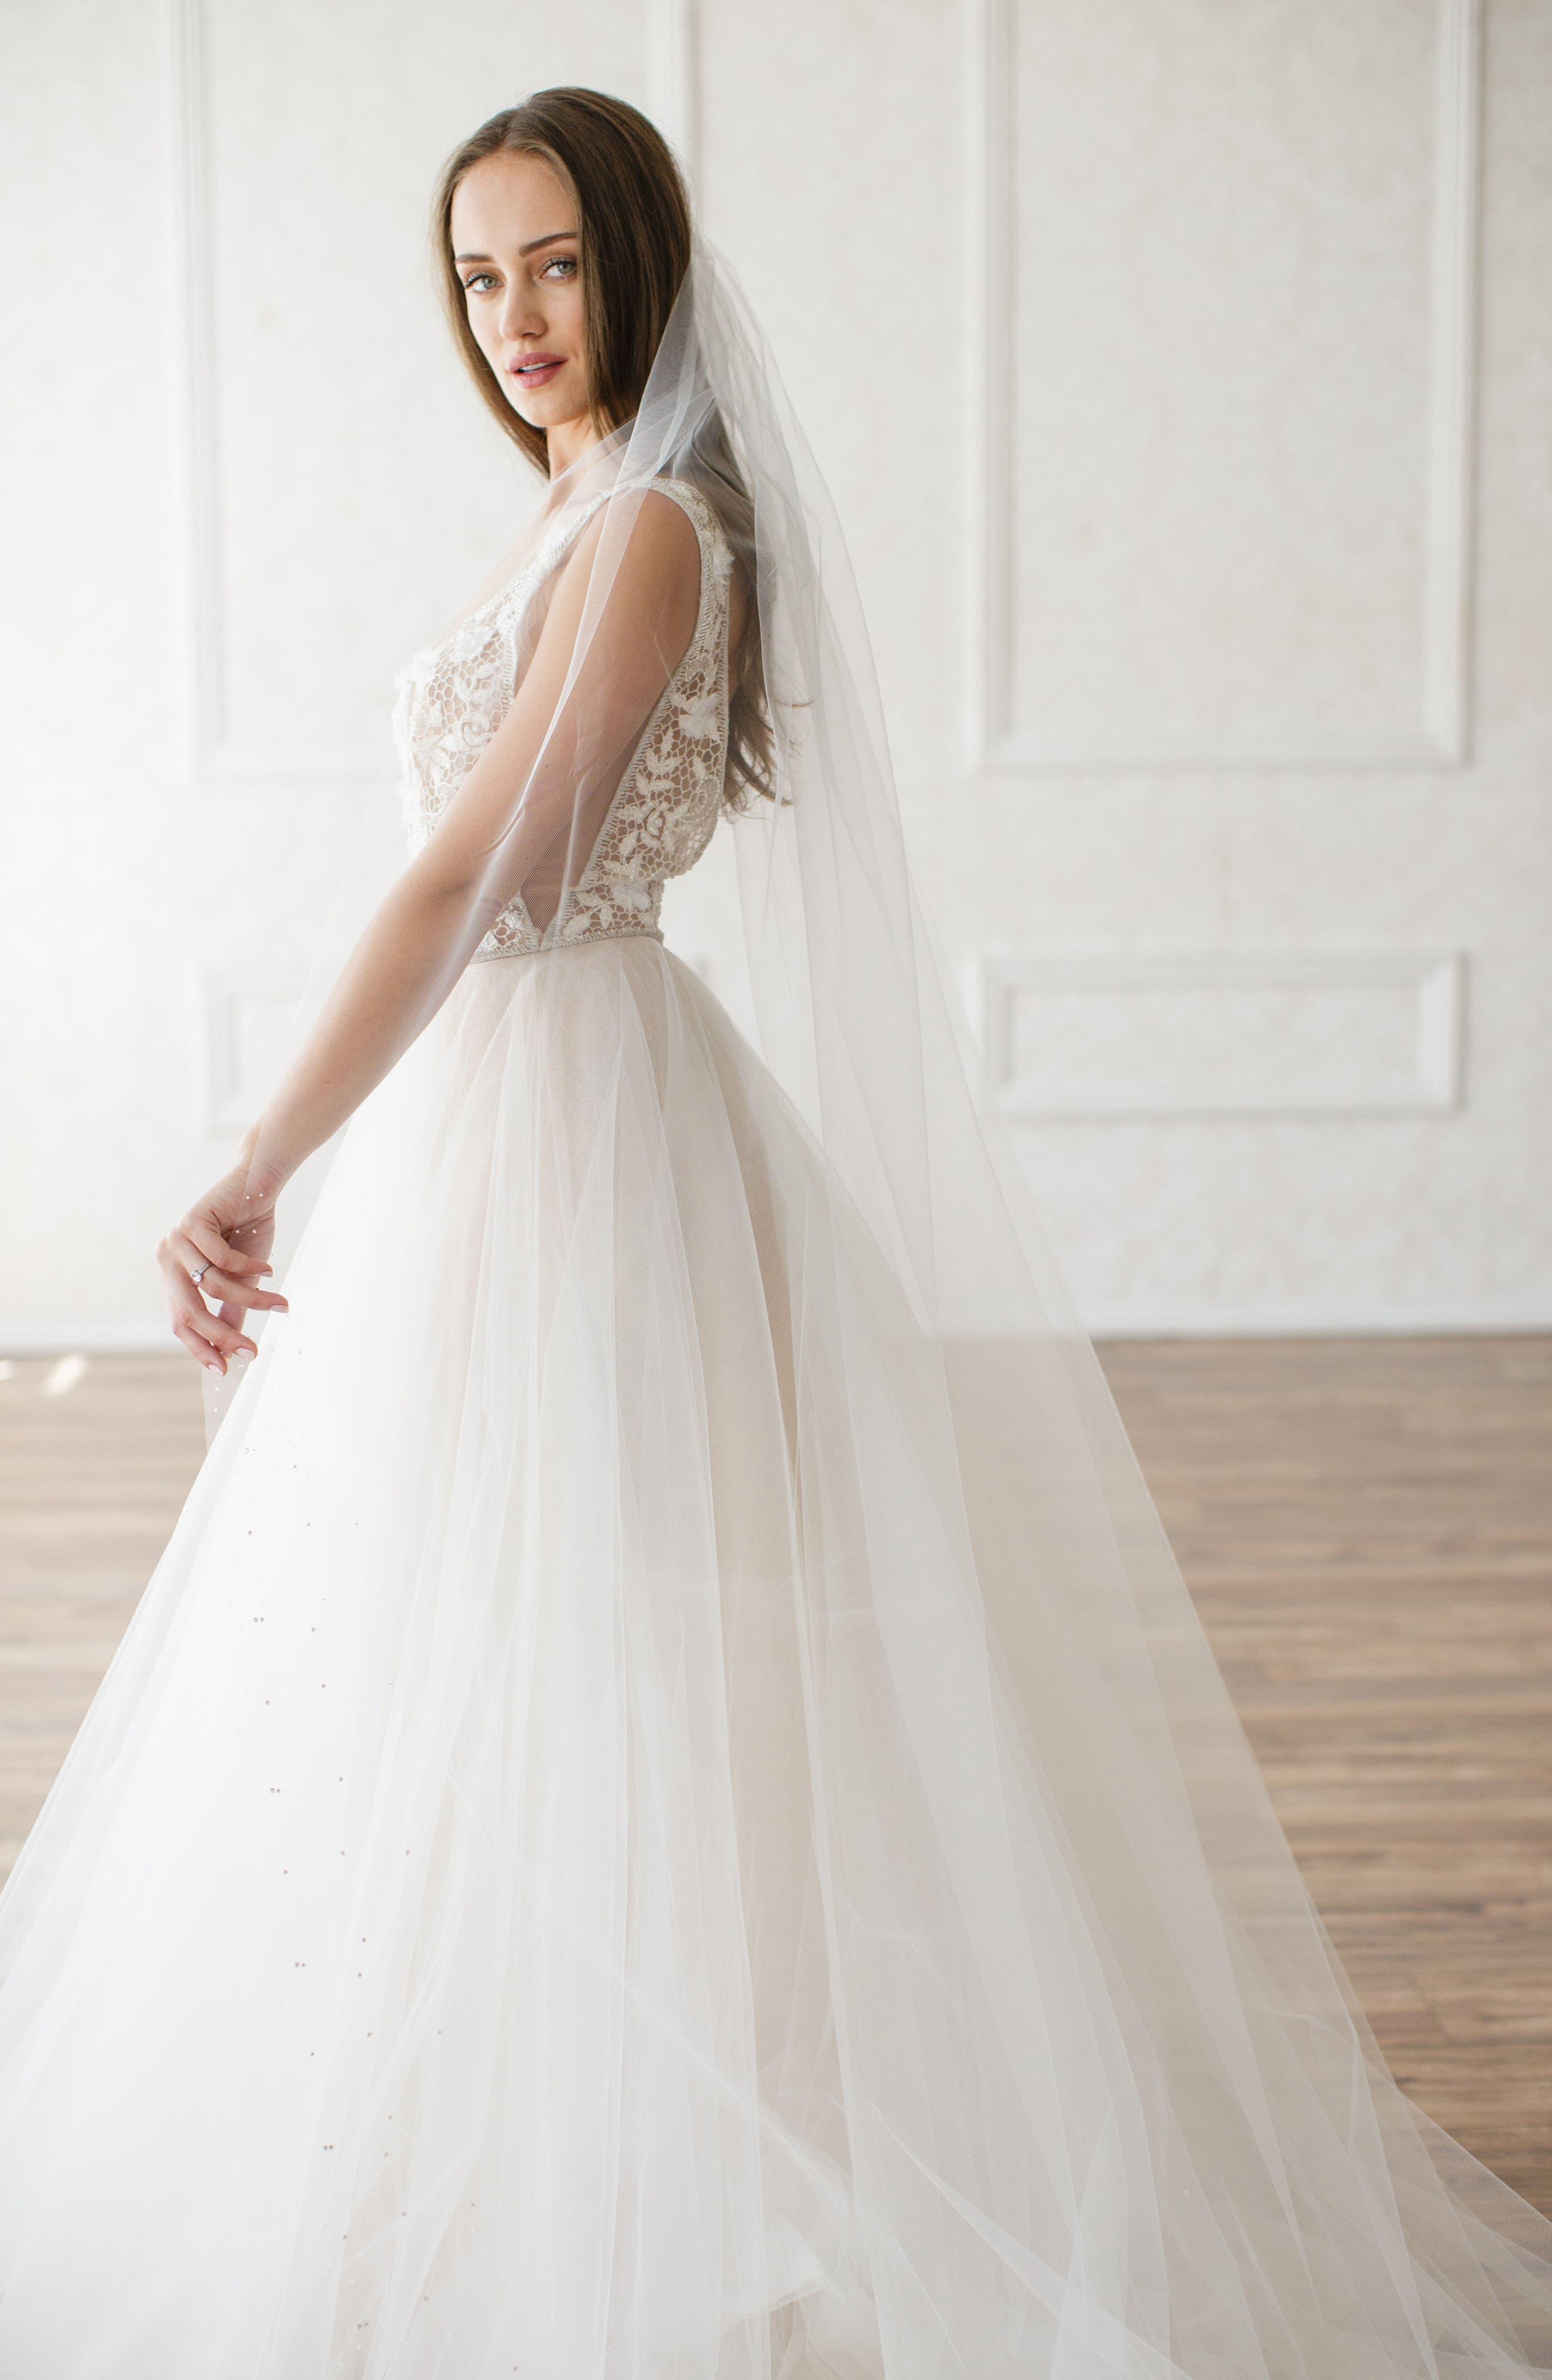 Main Image - Brides & Hairpins 'Christina' Tulle Veil